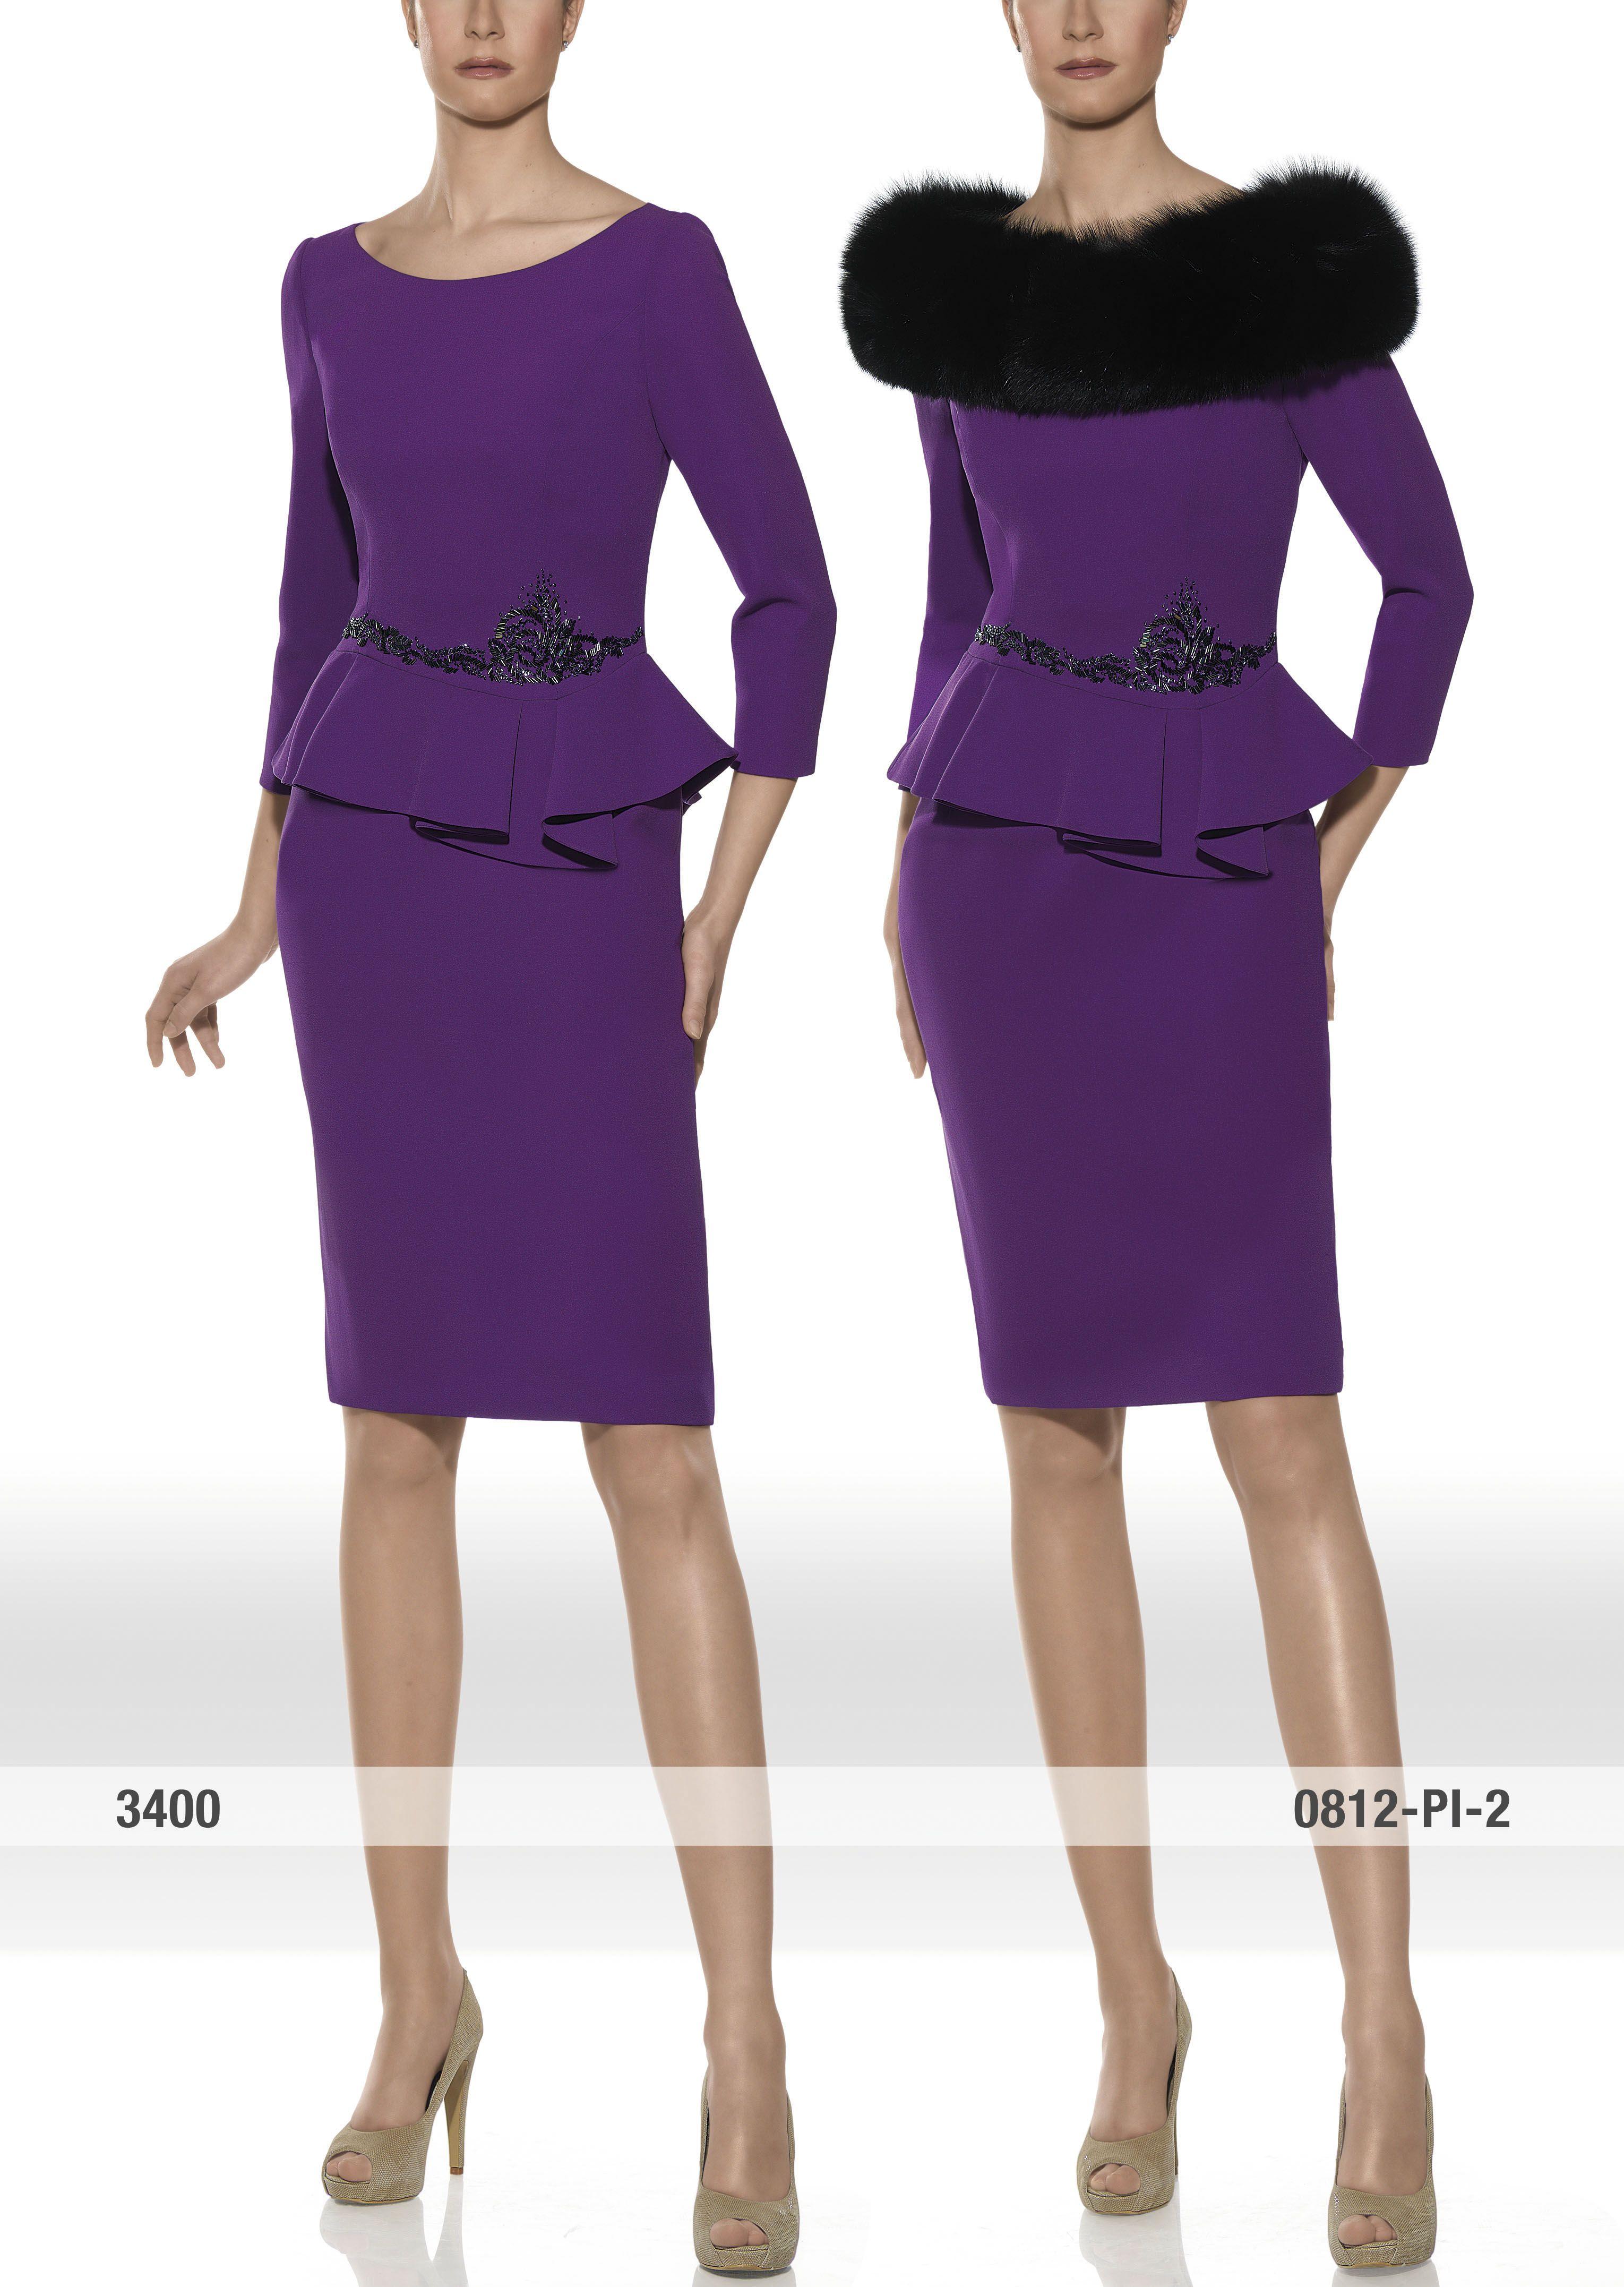 traje de madrina con estola de piel modelo 3400 | Teresa Ripoll ...